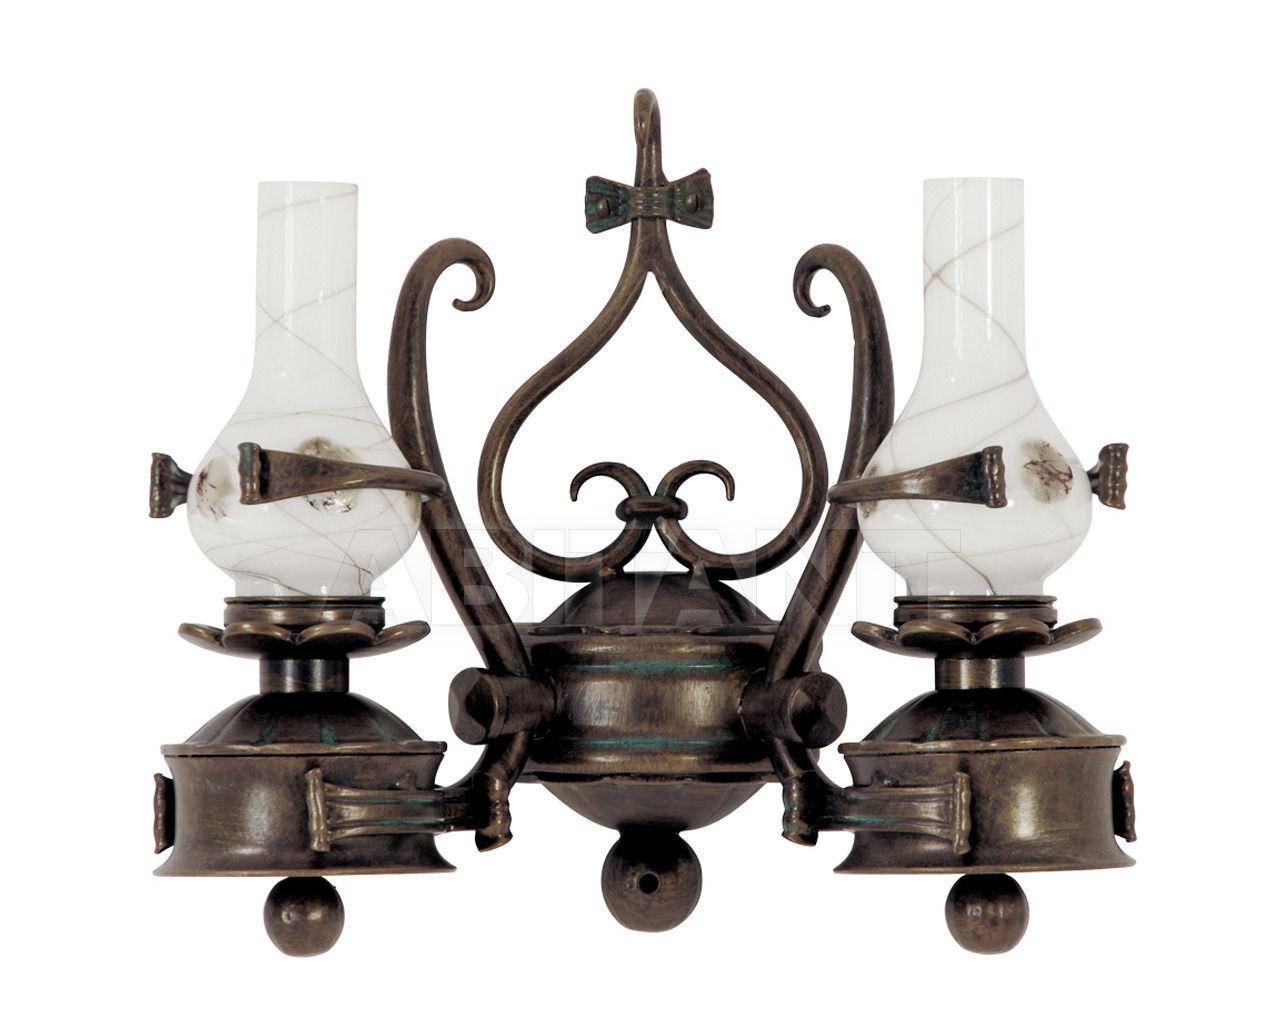 Купить Светильник настенный FMB Leuchten Schmiedeeisen Lampen Und Leuchten 94124